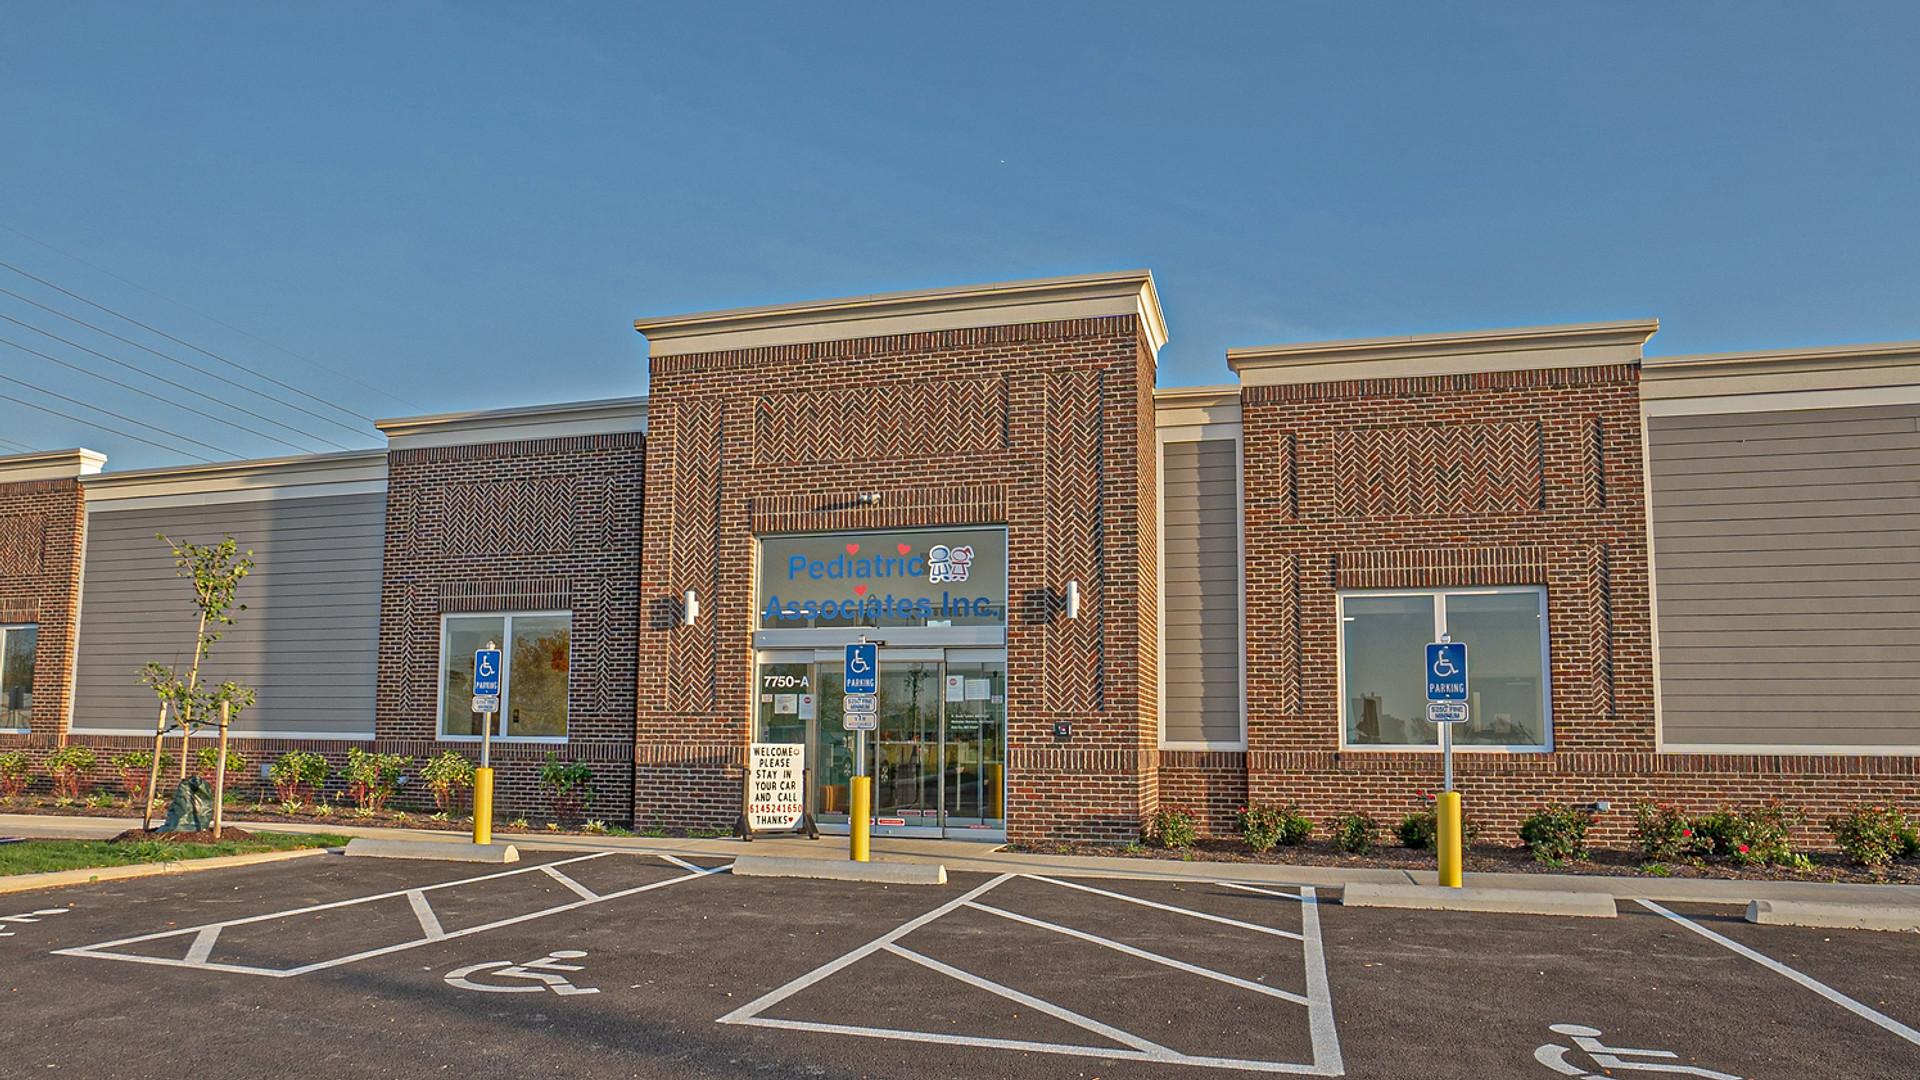 Pediatric Associates Inc, Canal Winchester, Ohio